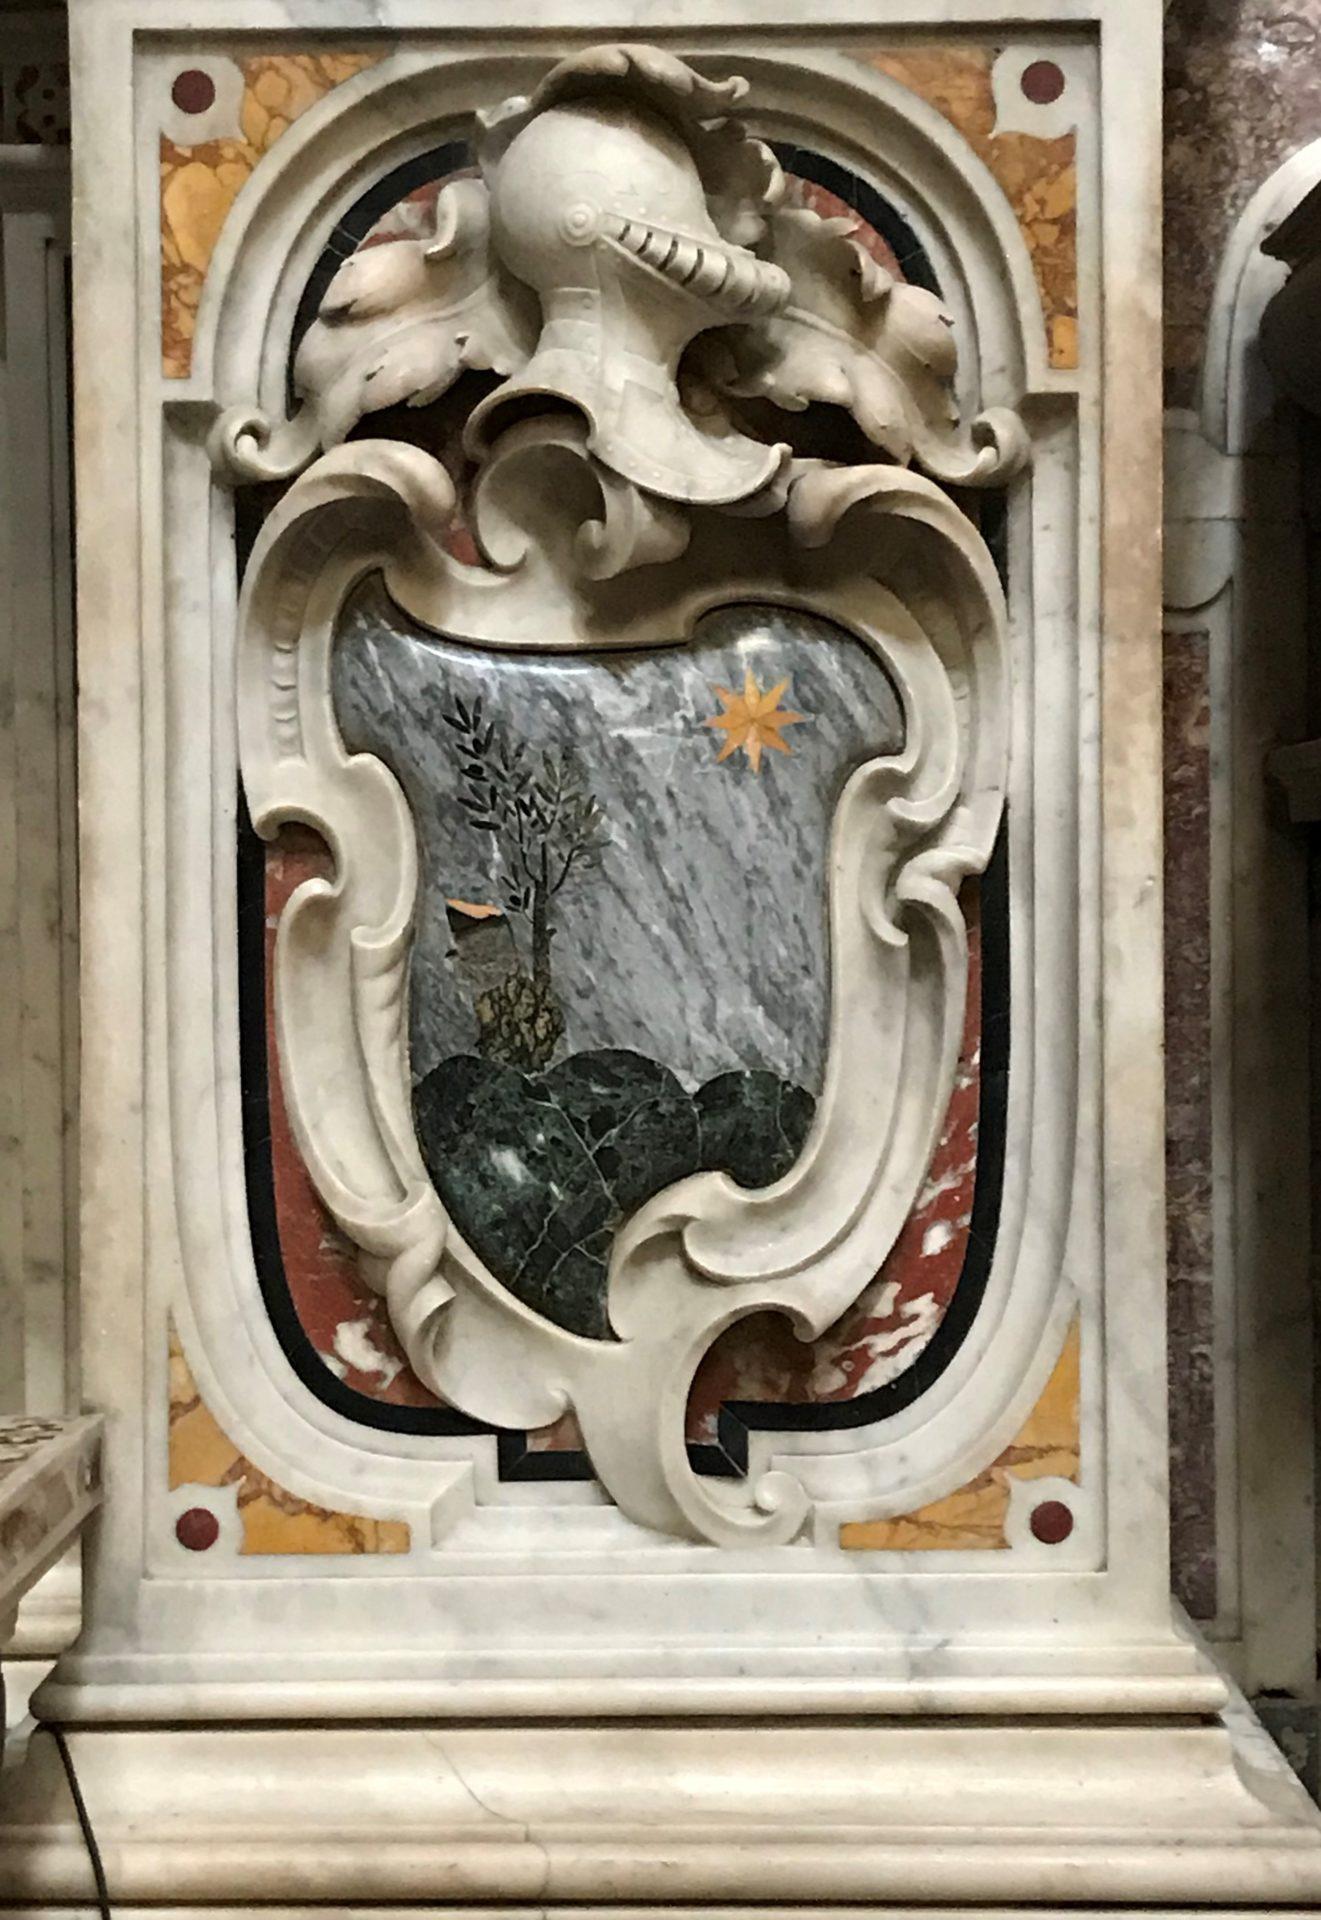 Marmi commessi in der Kirche Gesù Vechhio